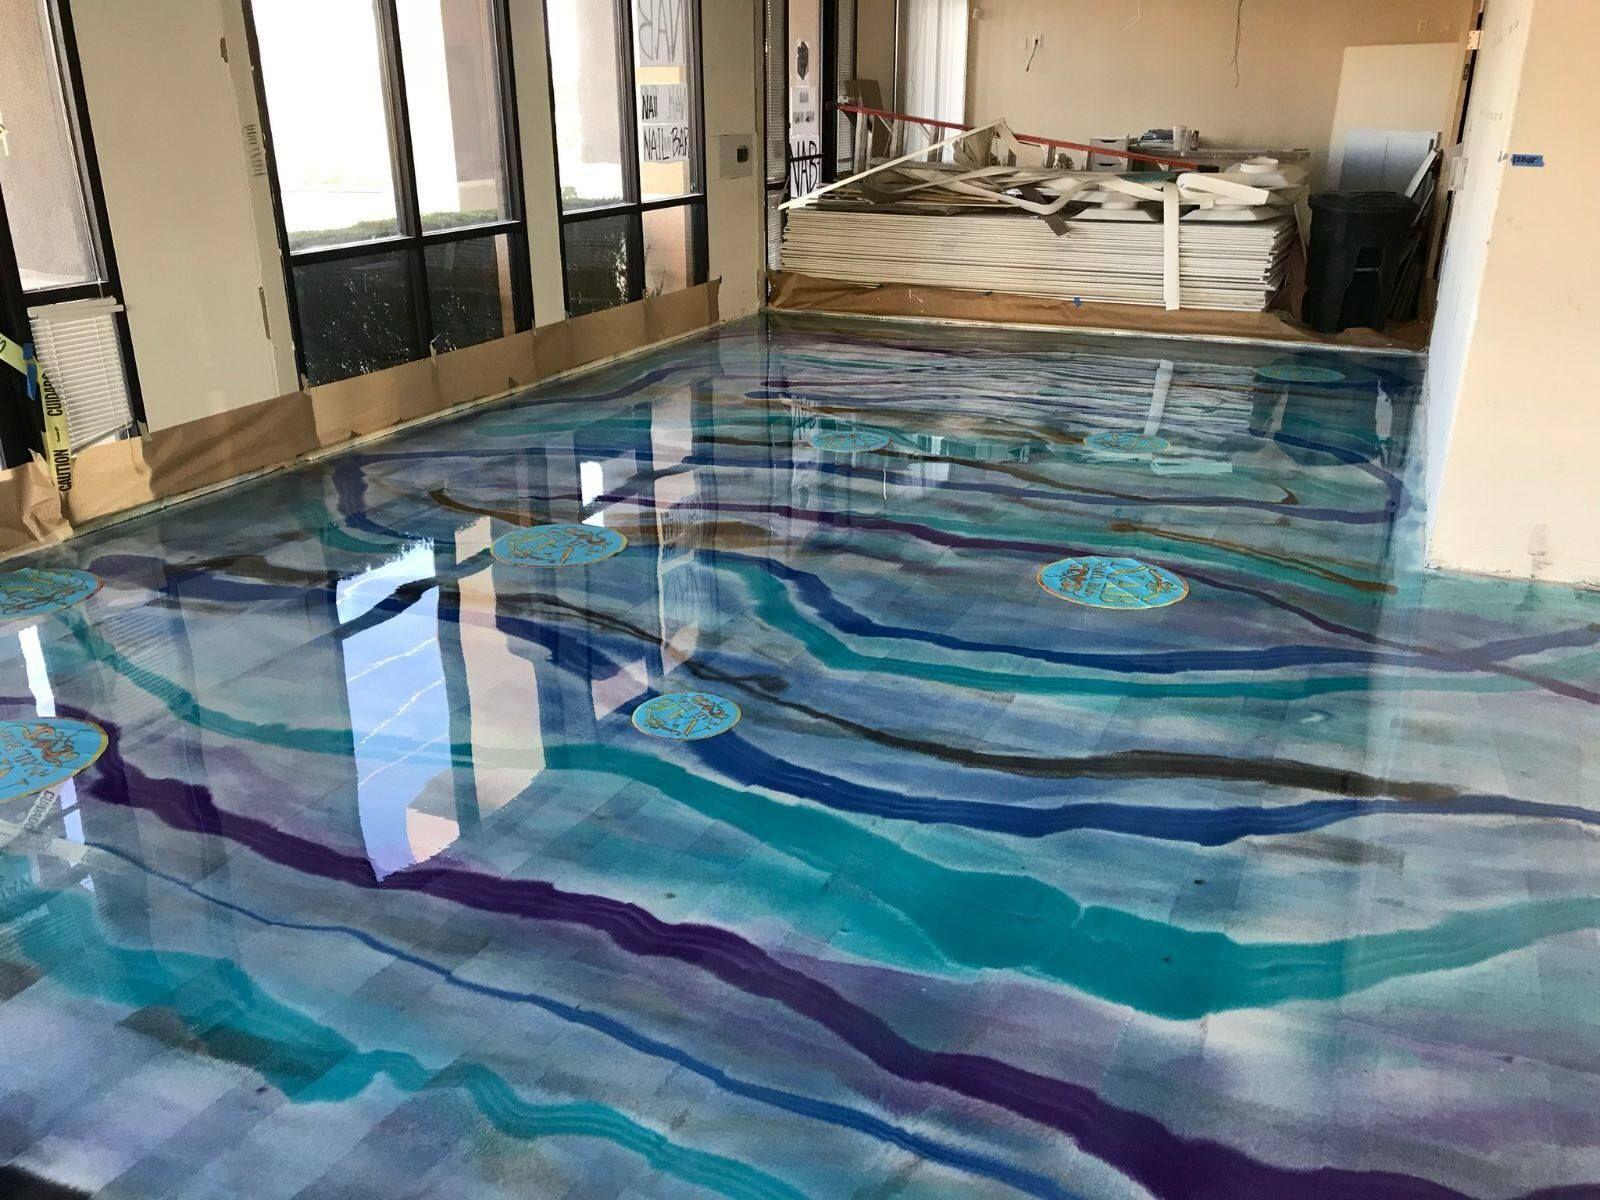 Decorative Epoxy Flooring by Hudson Valley Epoxy Flooring. Calling